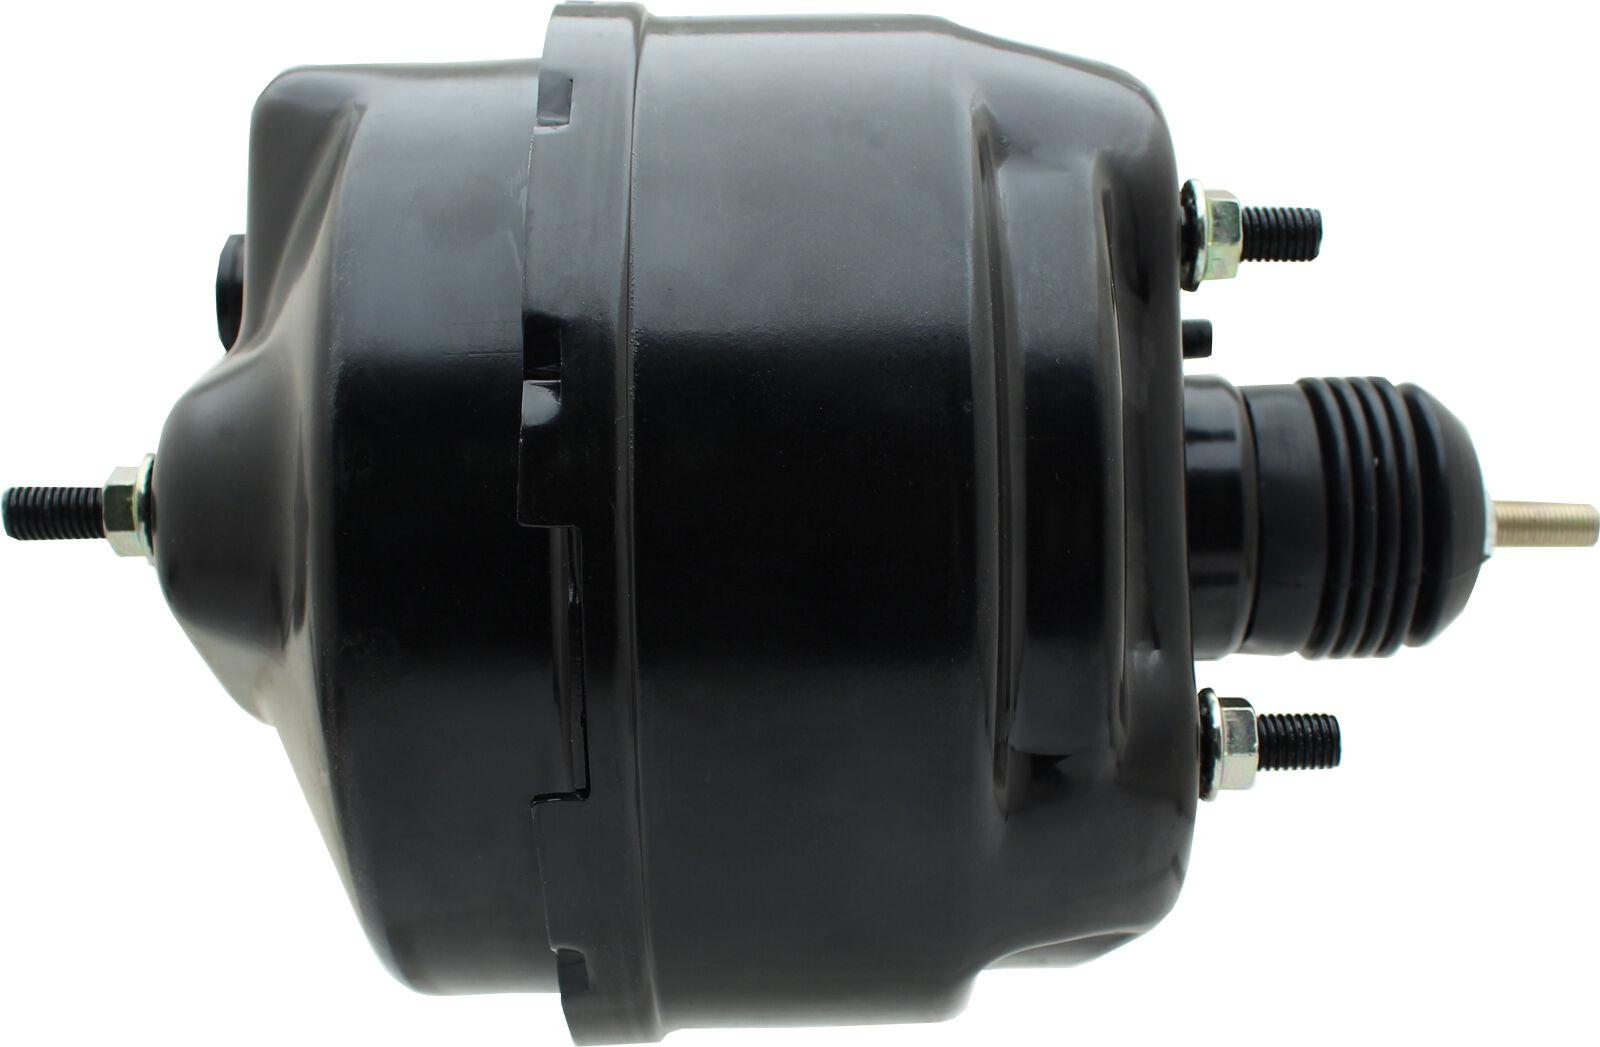 Power Brake Boosters : Chevy gmc truck firewall proline power brake